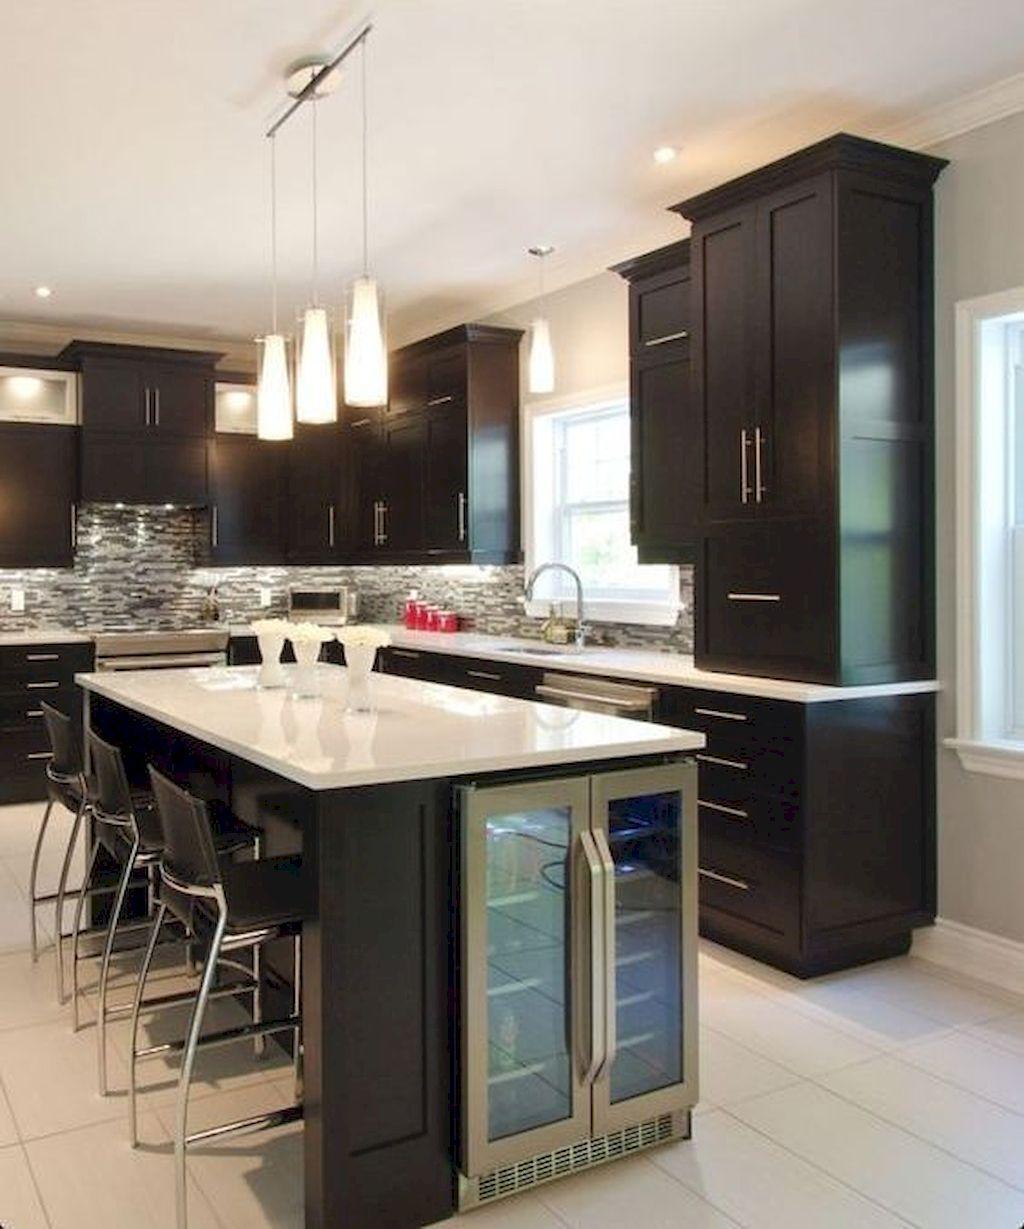 Pin on Kitchen Designs & Decor